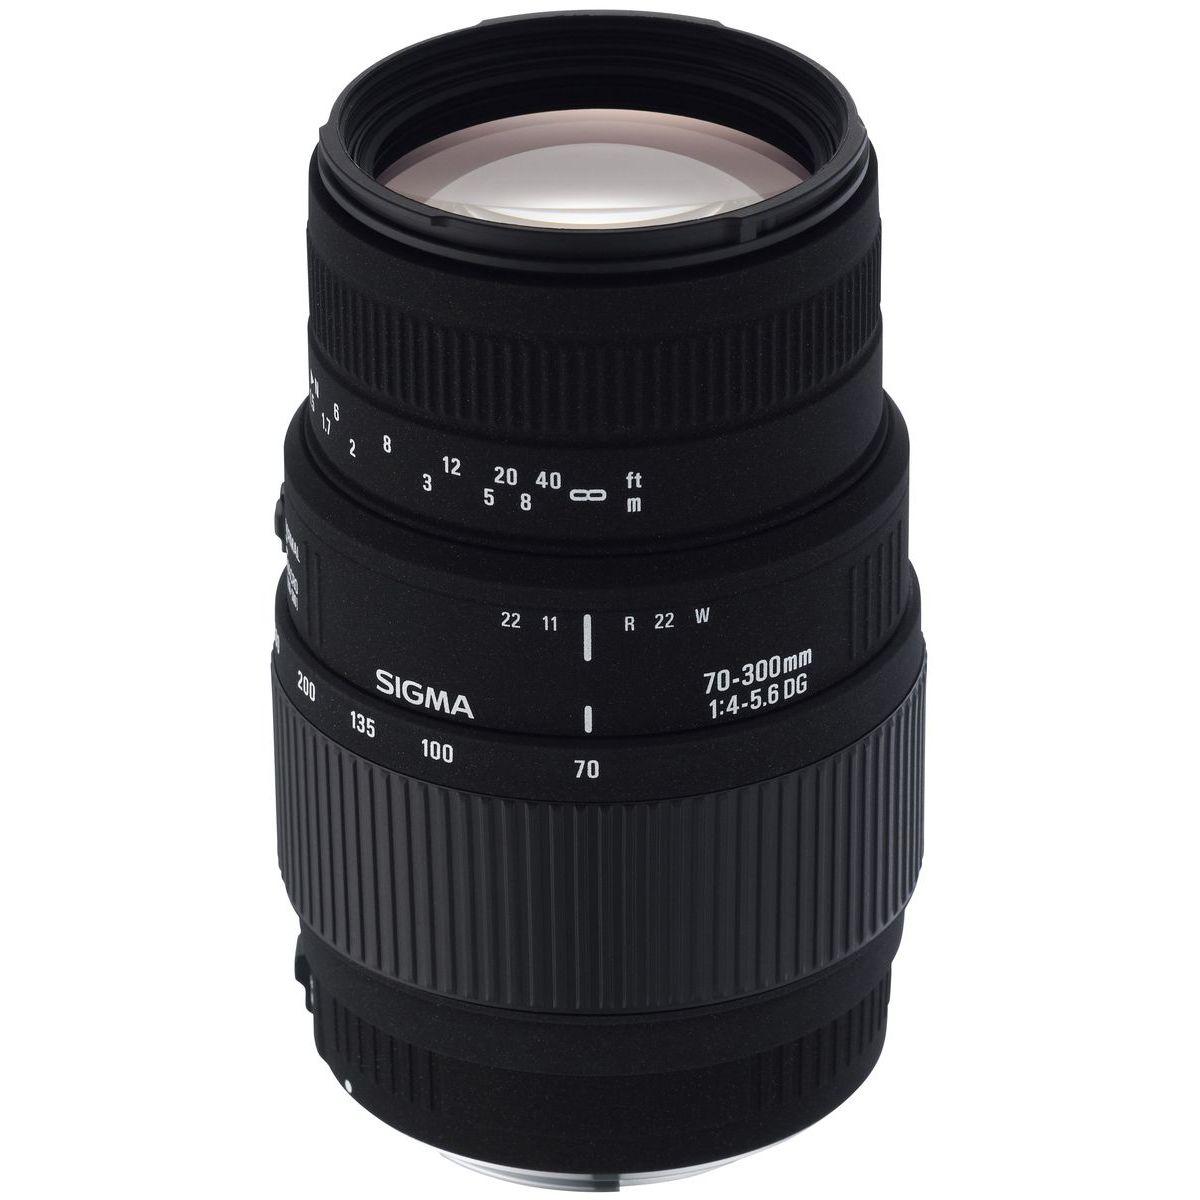 Objectif pour Reflex Plein Format SIGMA 70-300mm f/4-5.6 Macro DG APO Canon